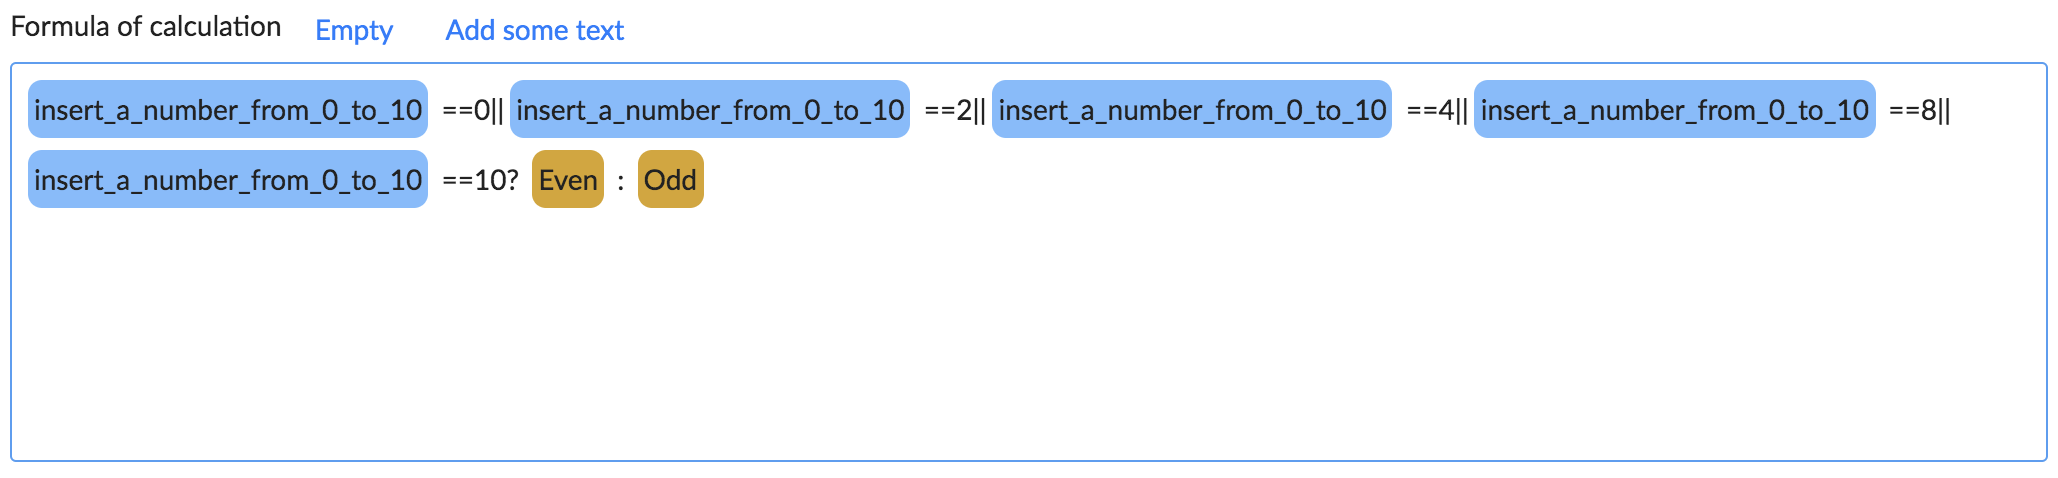 Odd or even calculation